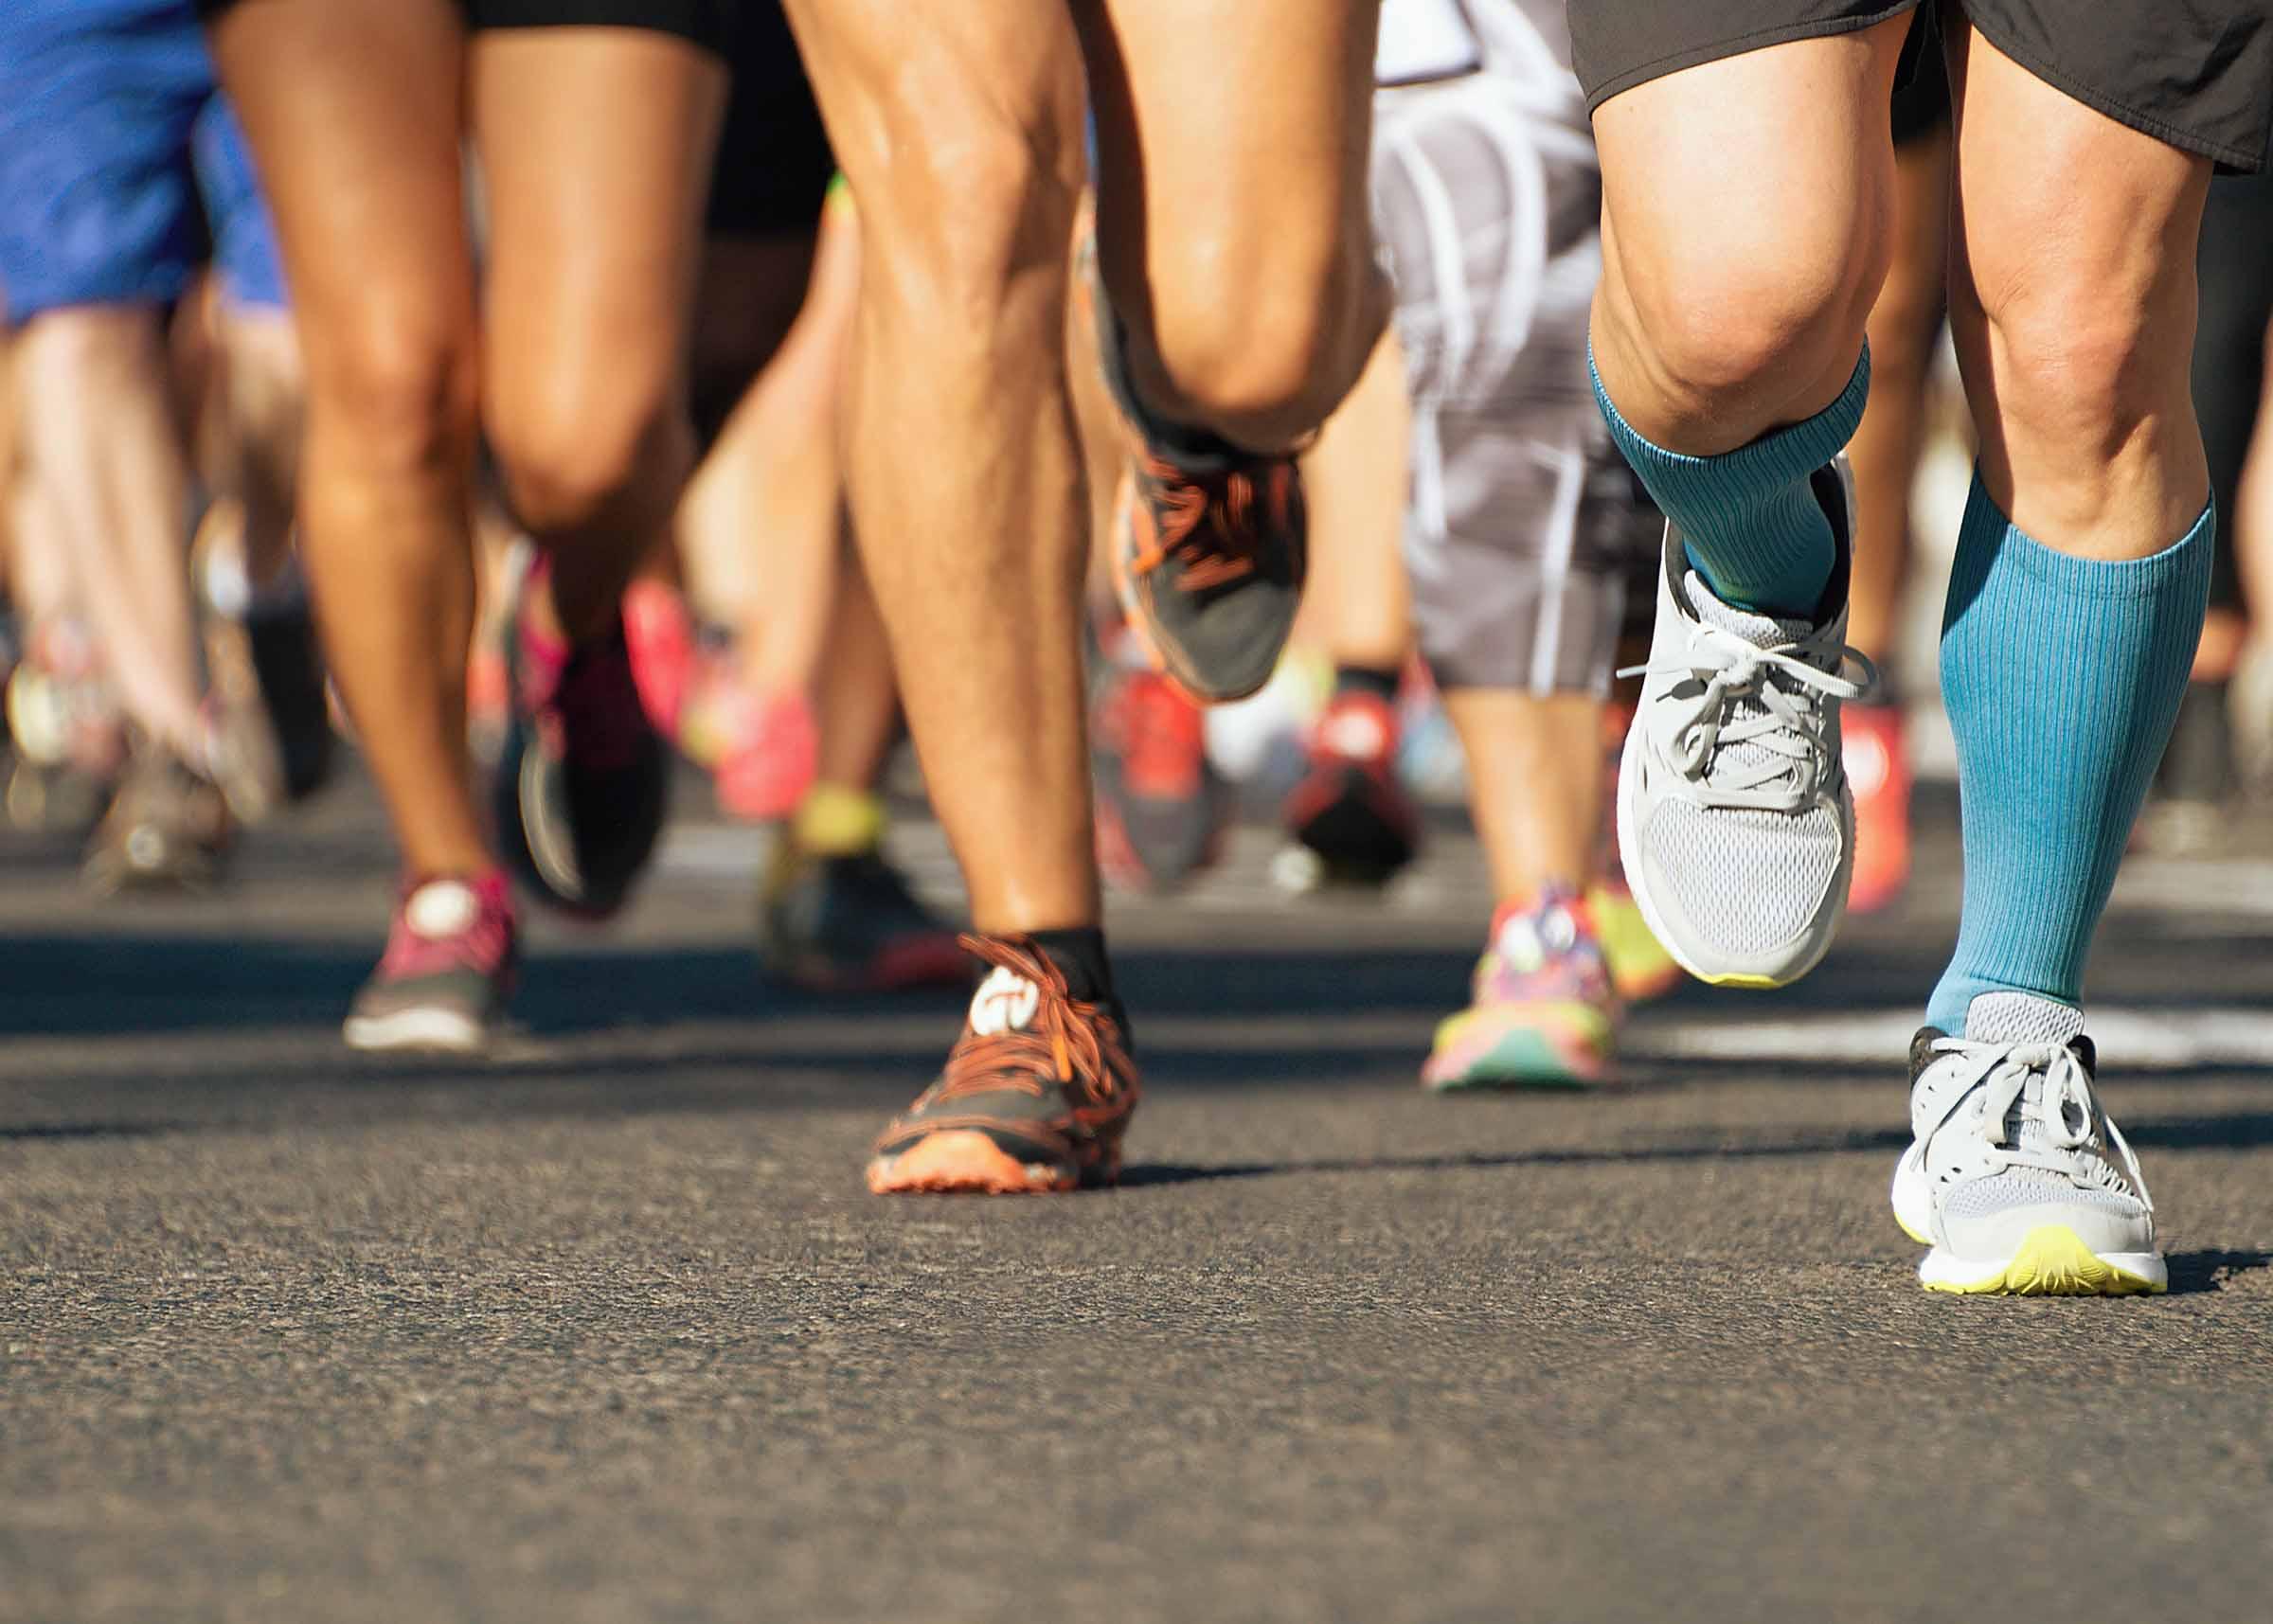 Feet of people racing